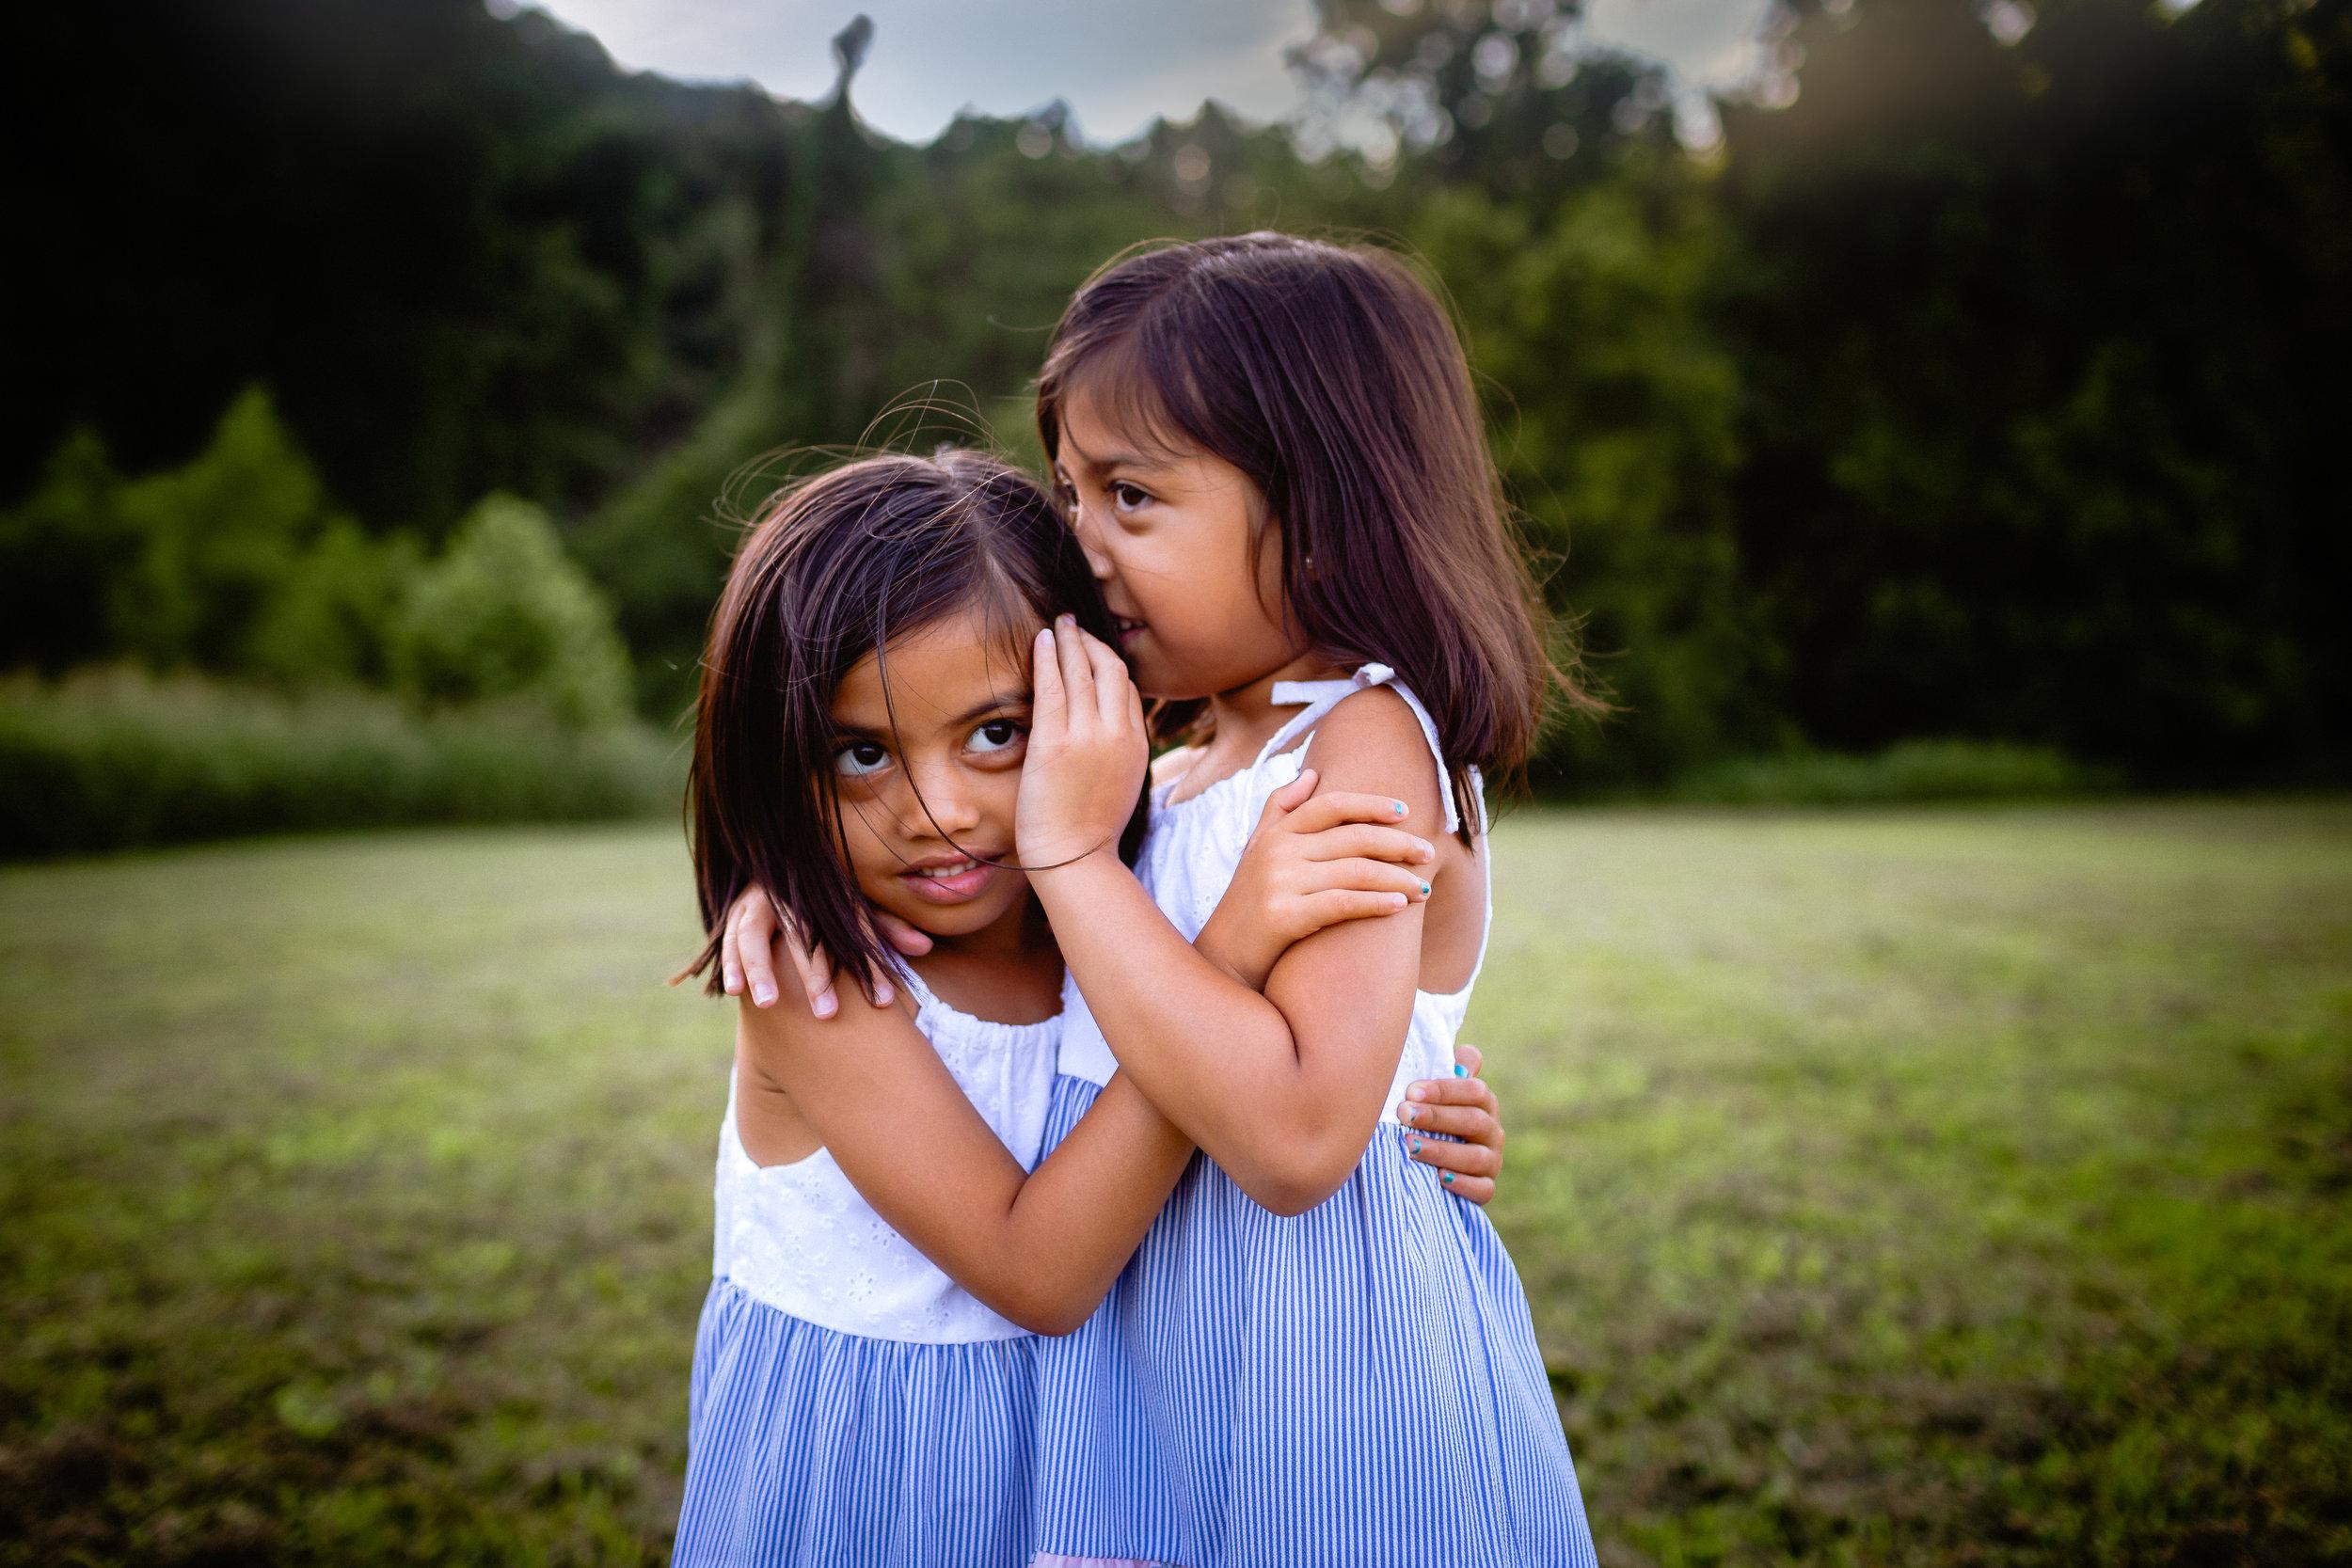 sisters whispering secrets lifestyle photograph waynesville mo